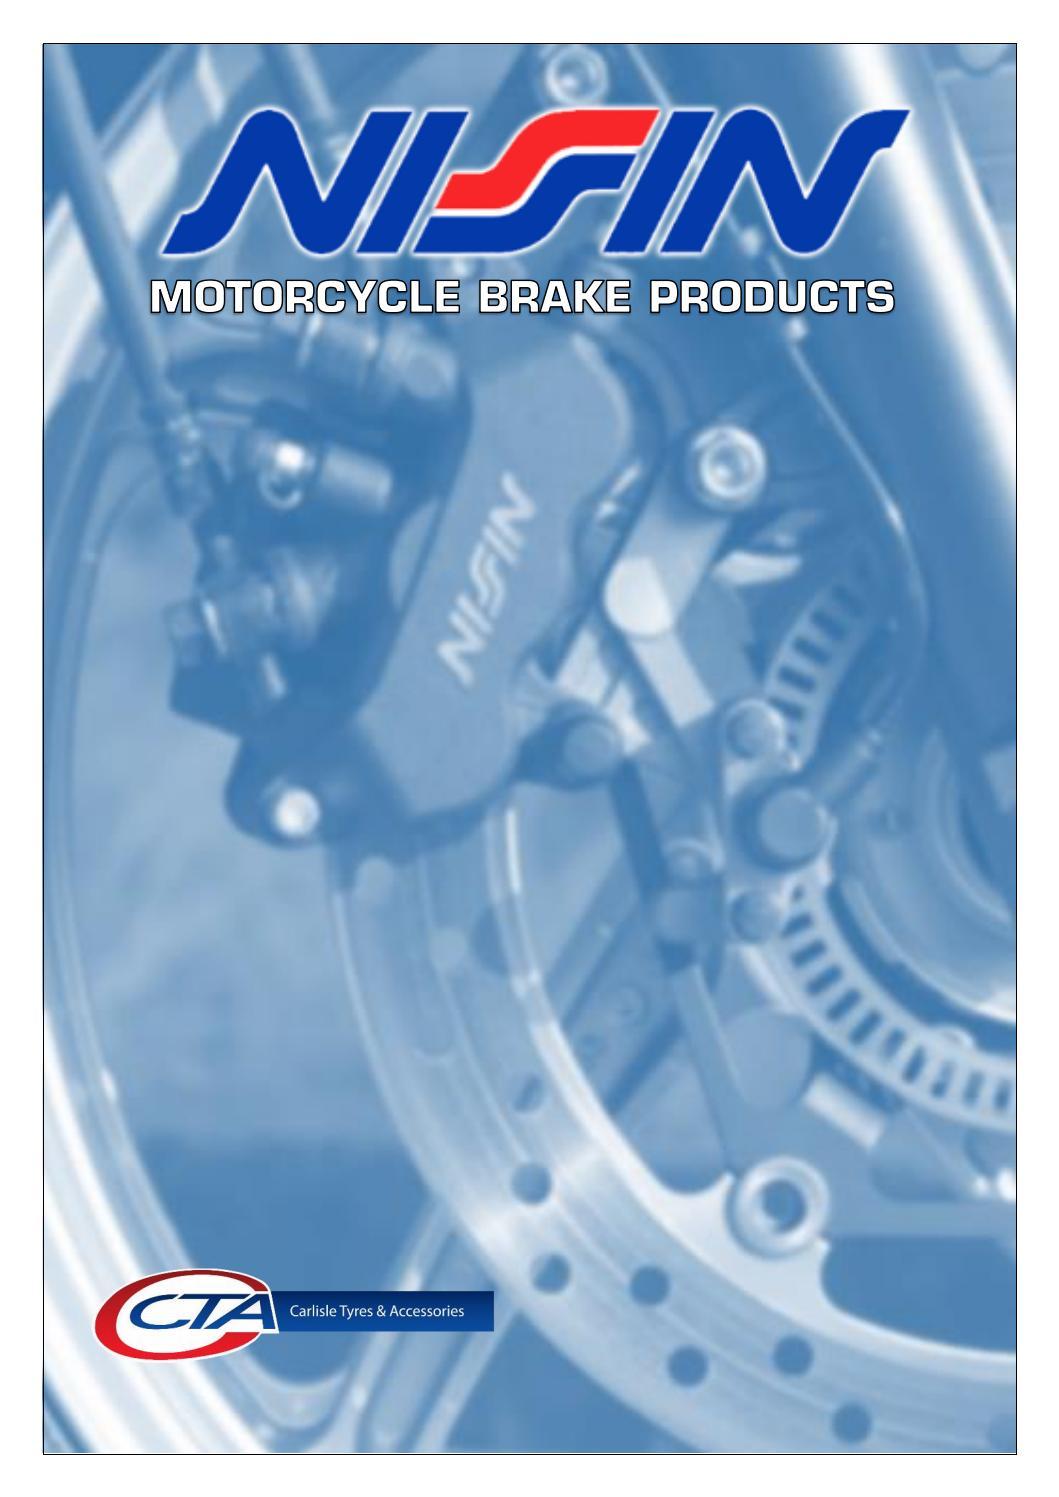 Brake Lever KR BRAKE LEVER KTM SC 620 lc4 Super Competition 94-01 NEW..